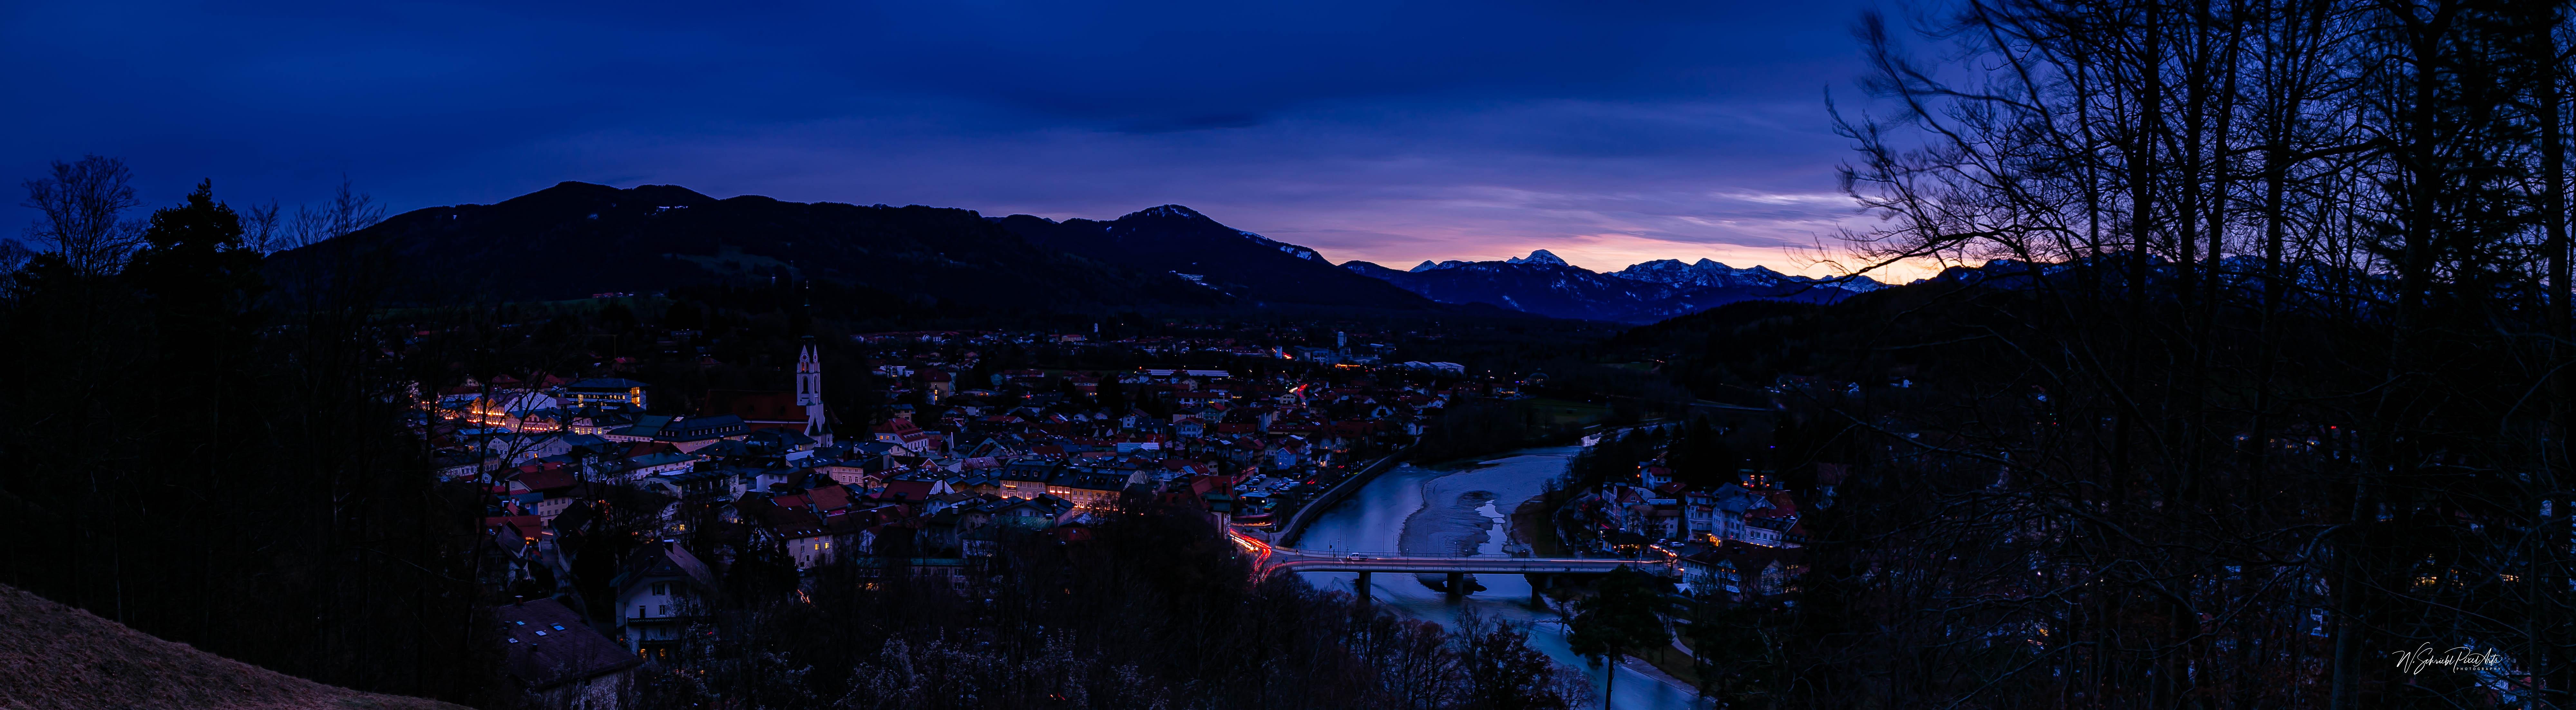 Bad Tölz - blaue Stunde